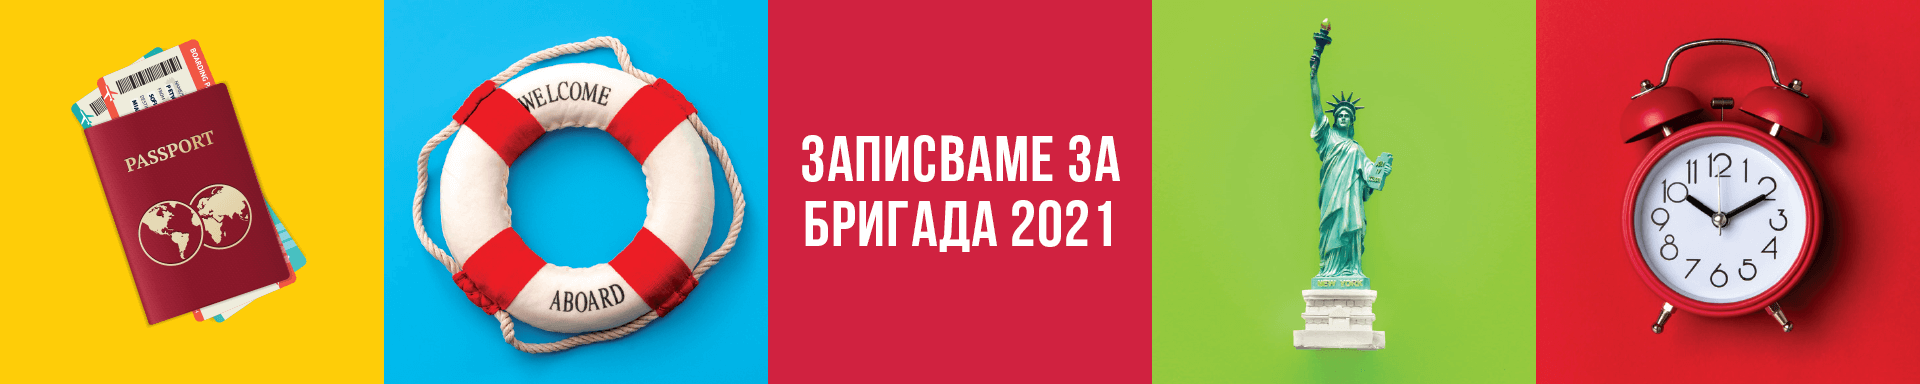 Usit Colours записва за бригада 2021